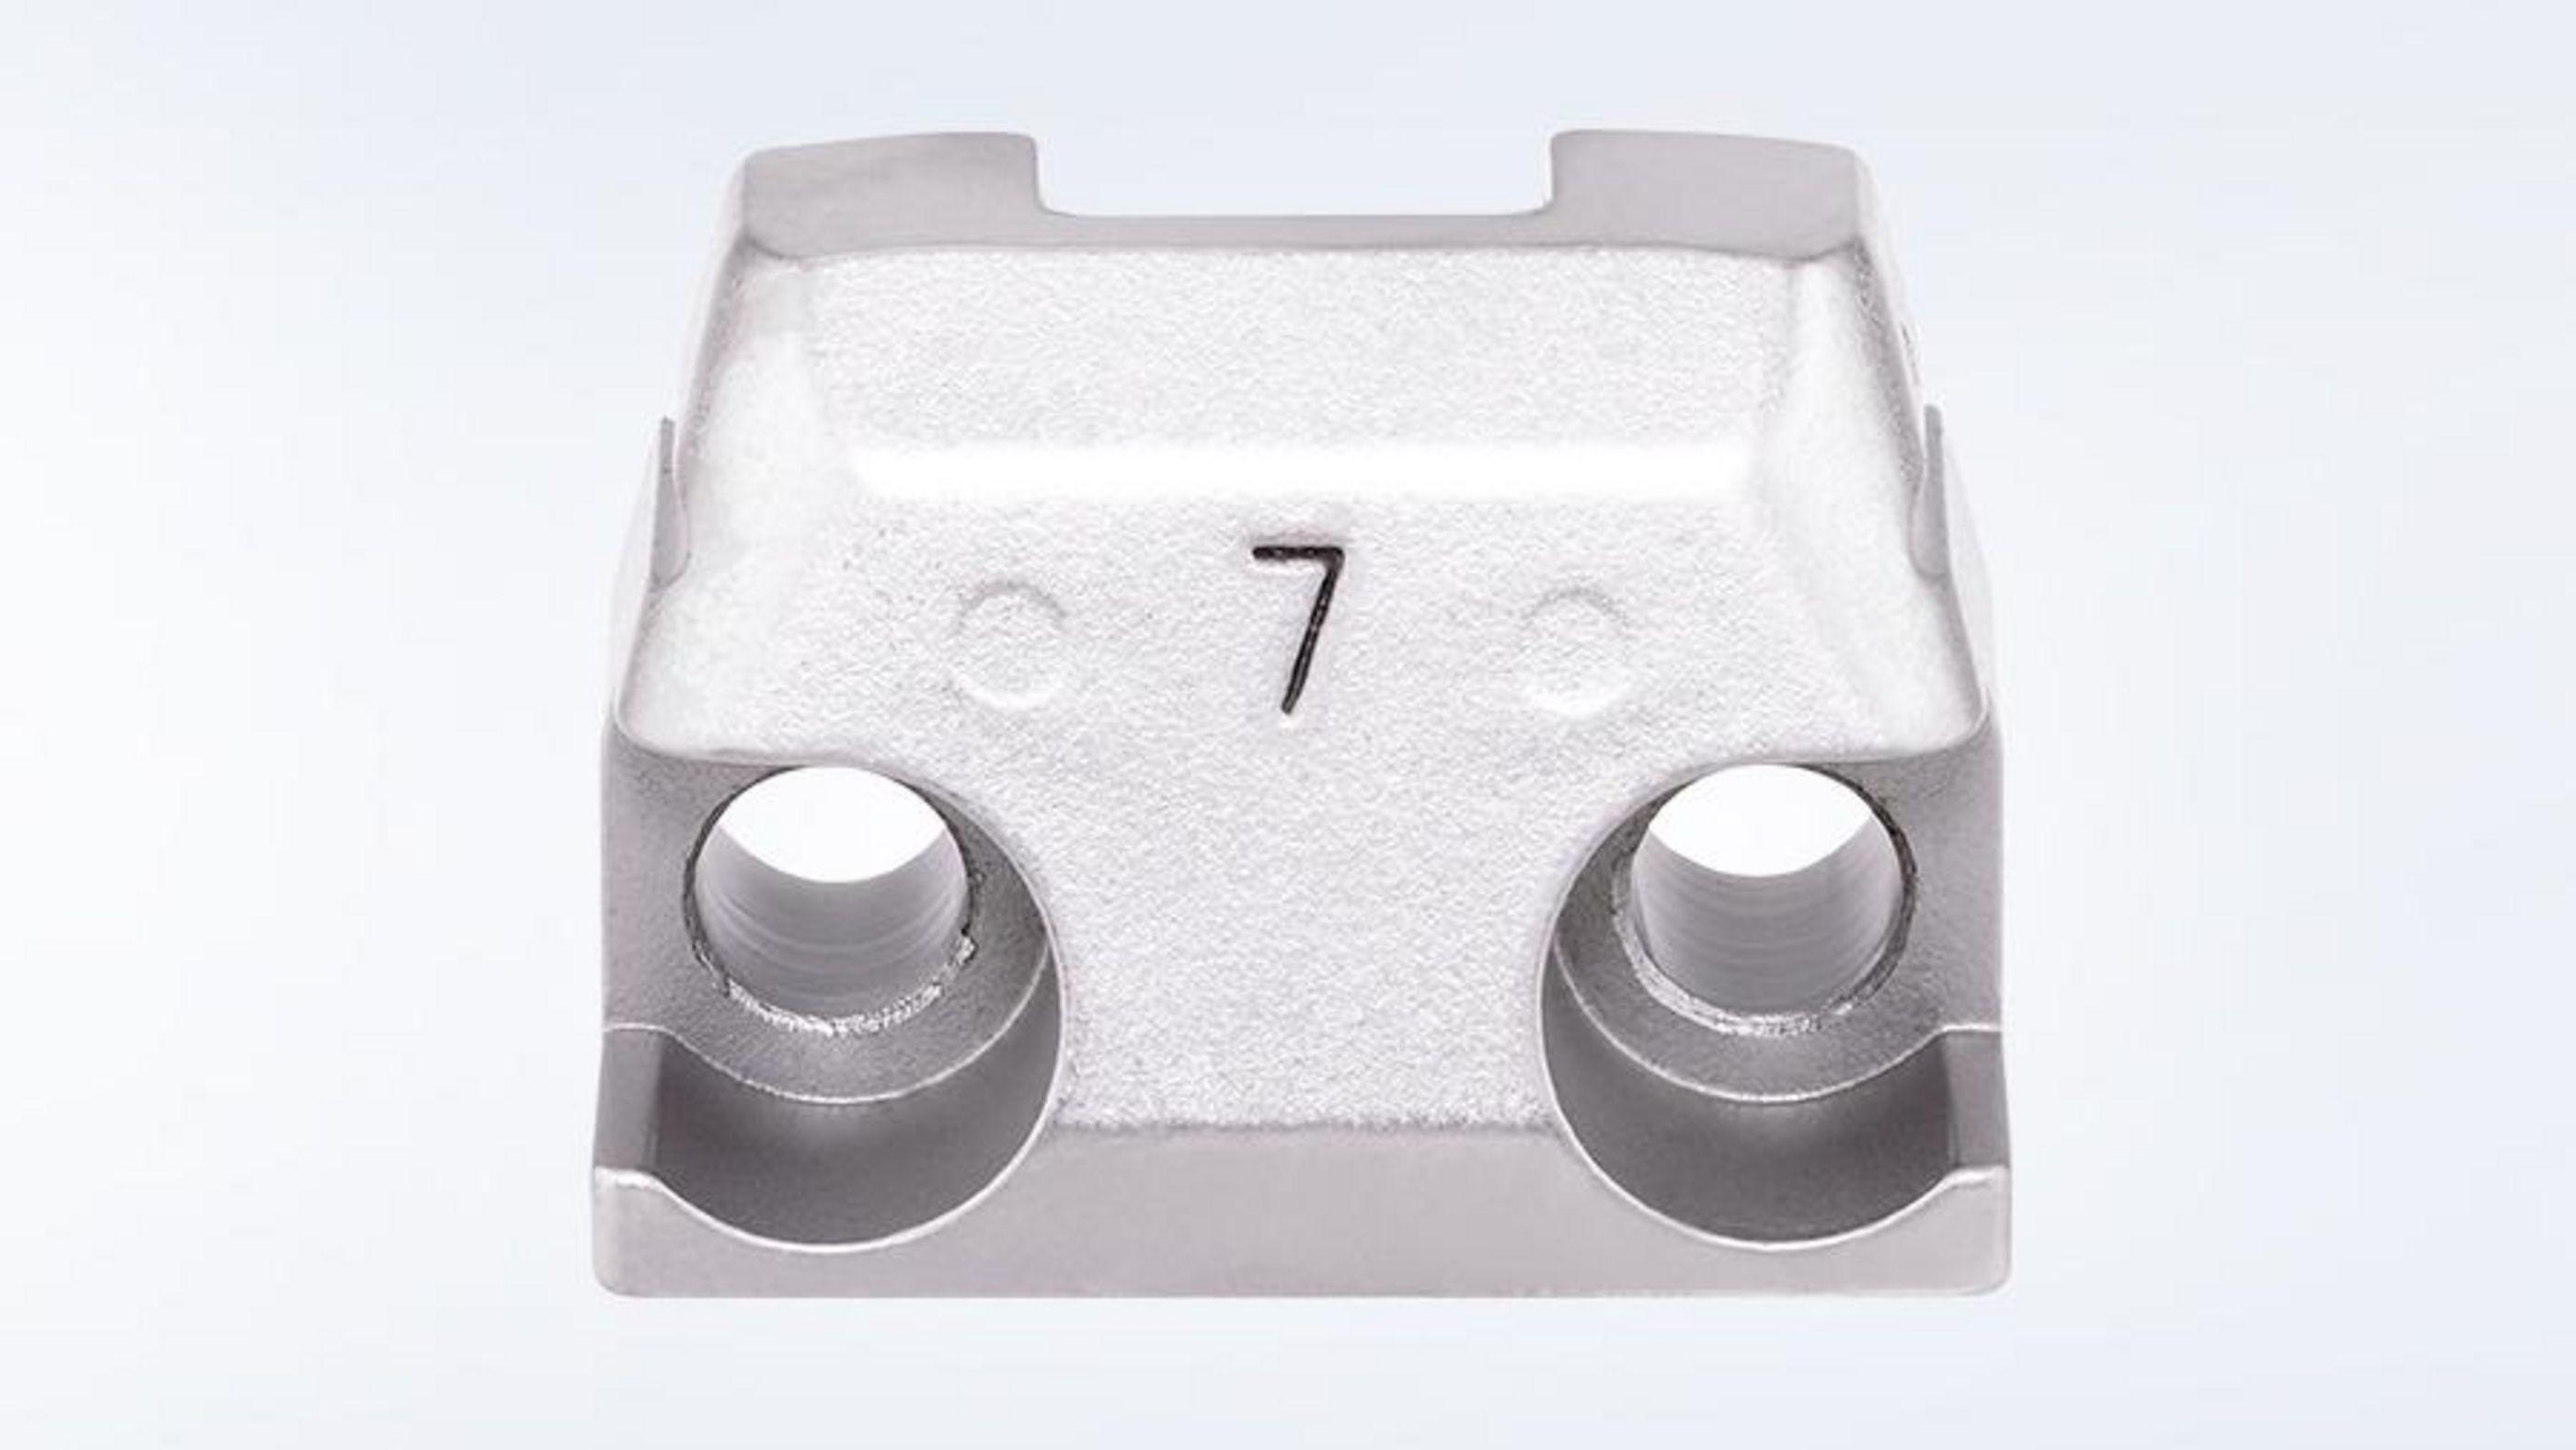 TruTool N 700, Matrize 7